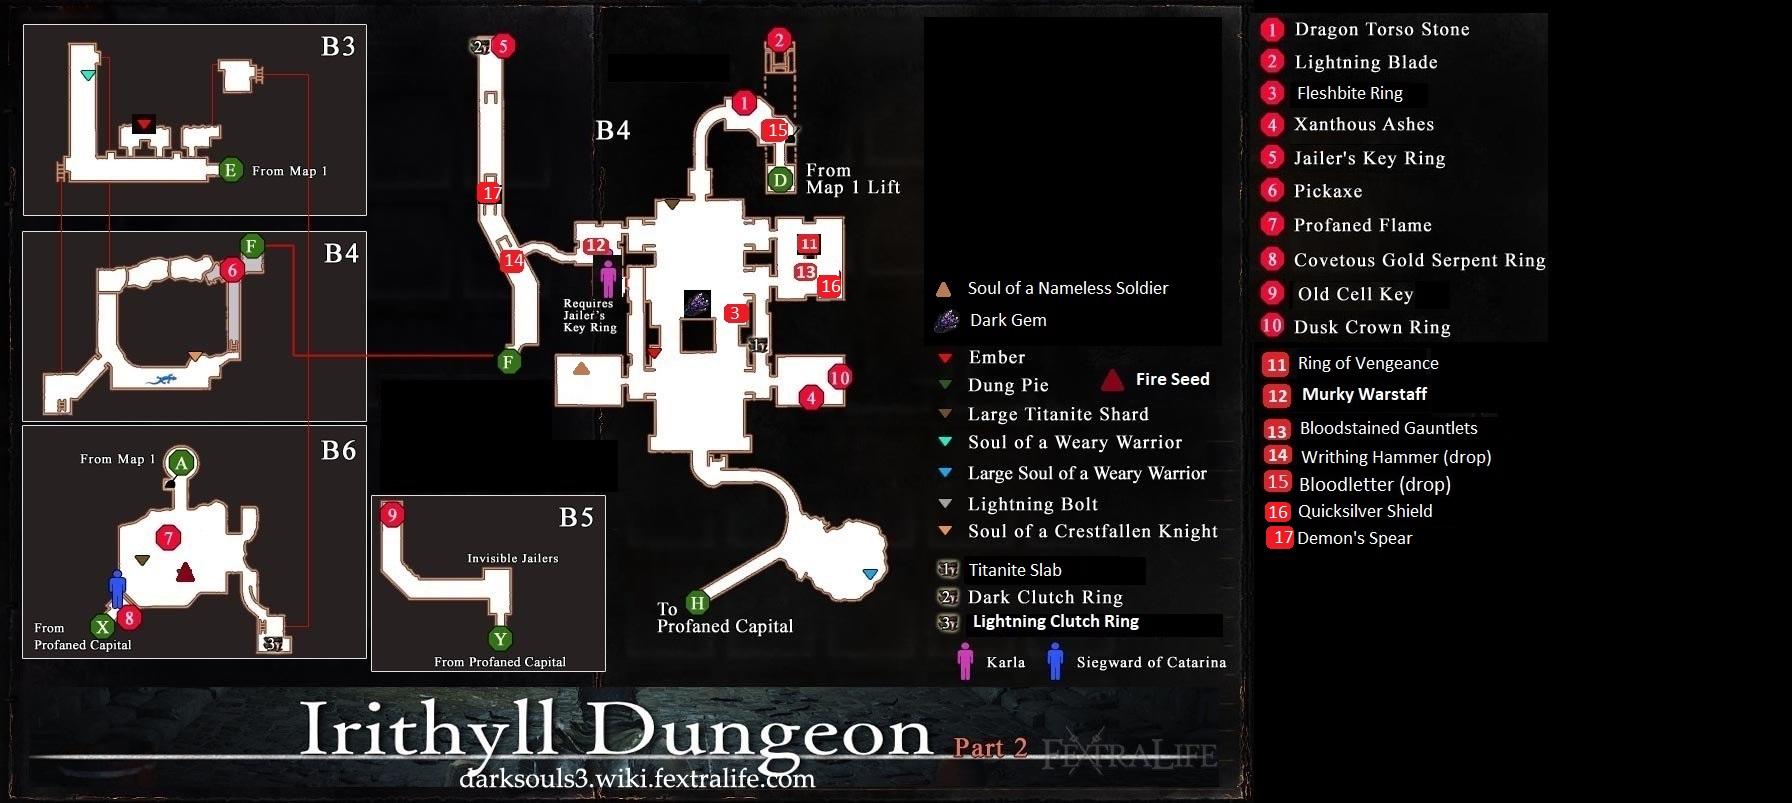 irithyll_dungeon_map2.jpg